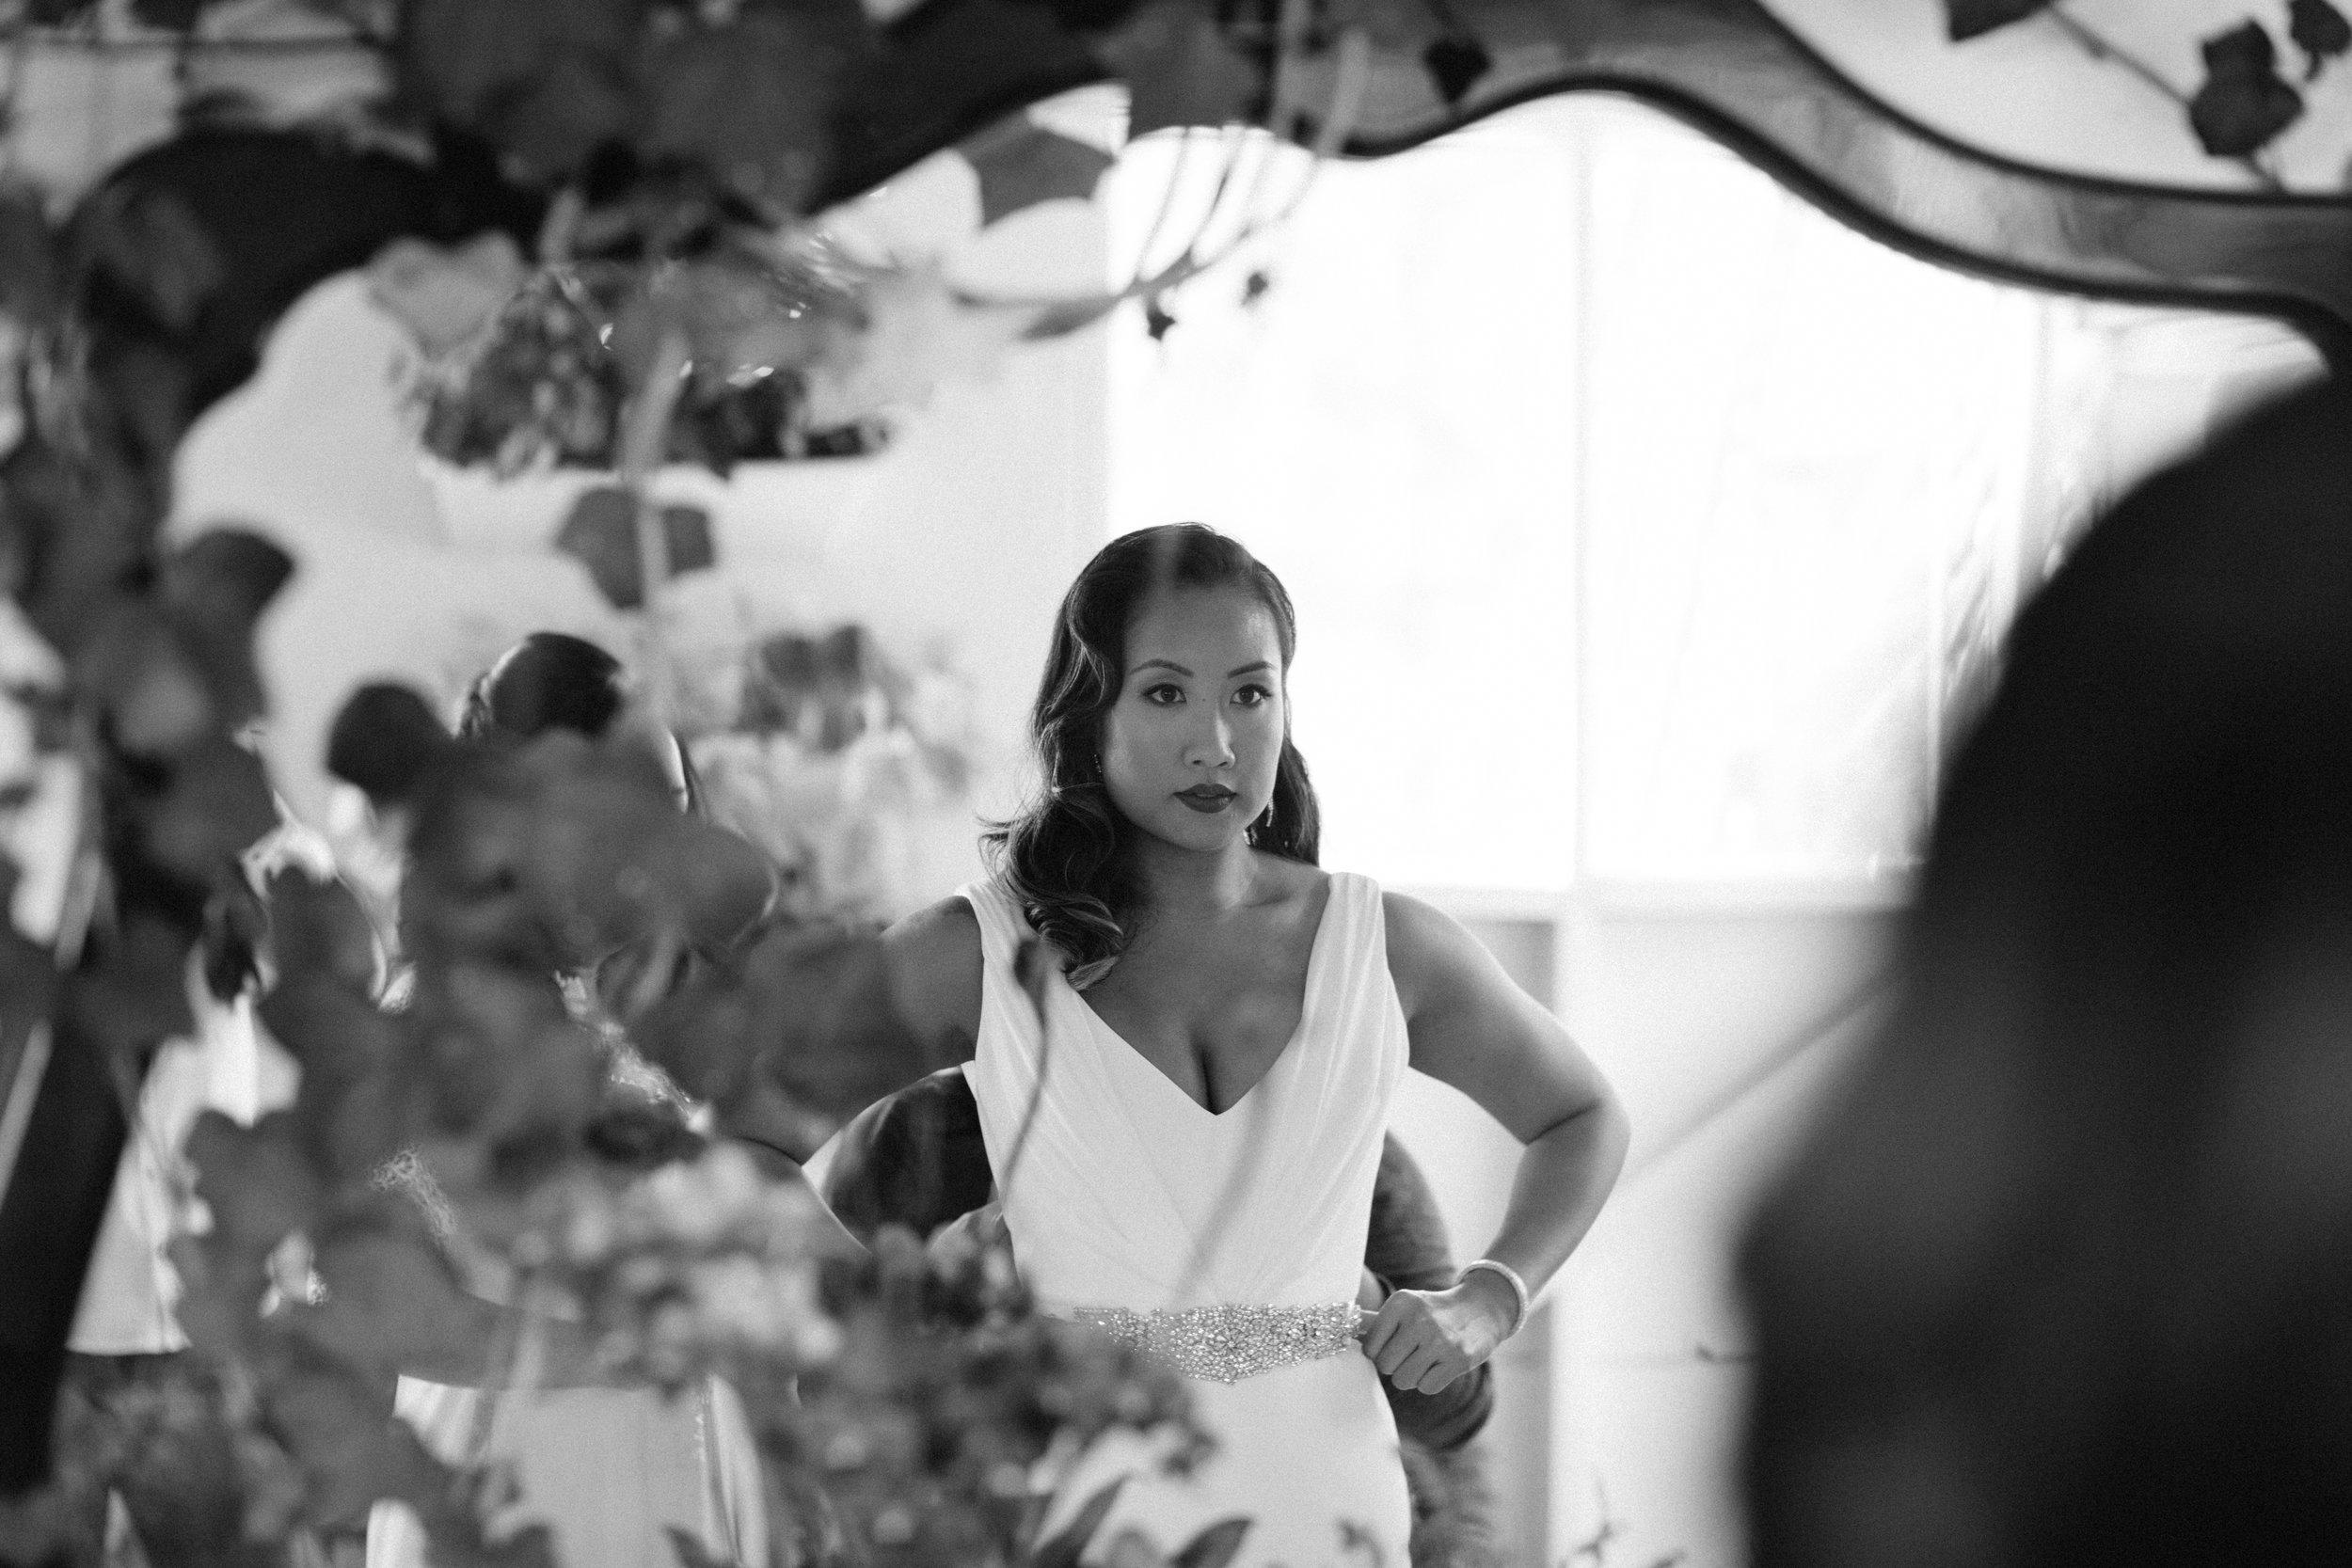 silk-crepe-v-neck-wedding-dress-3.jpg